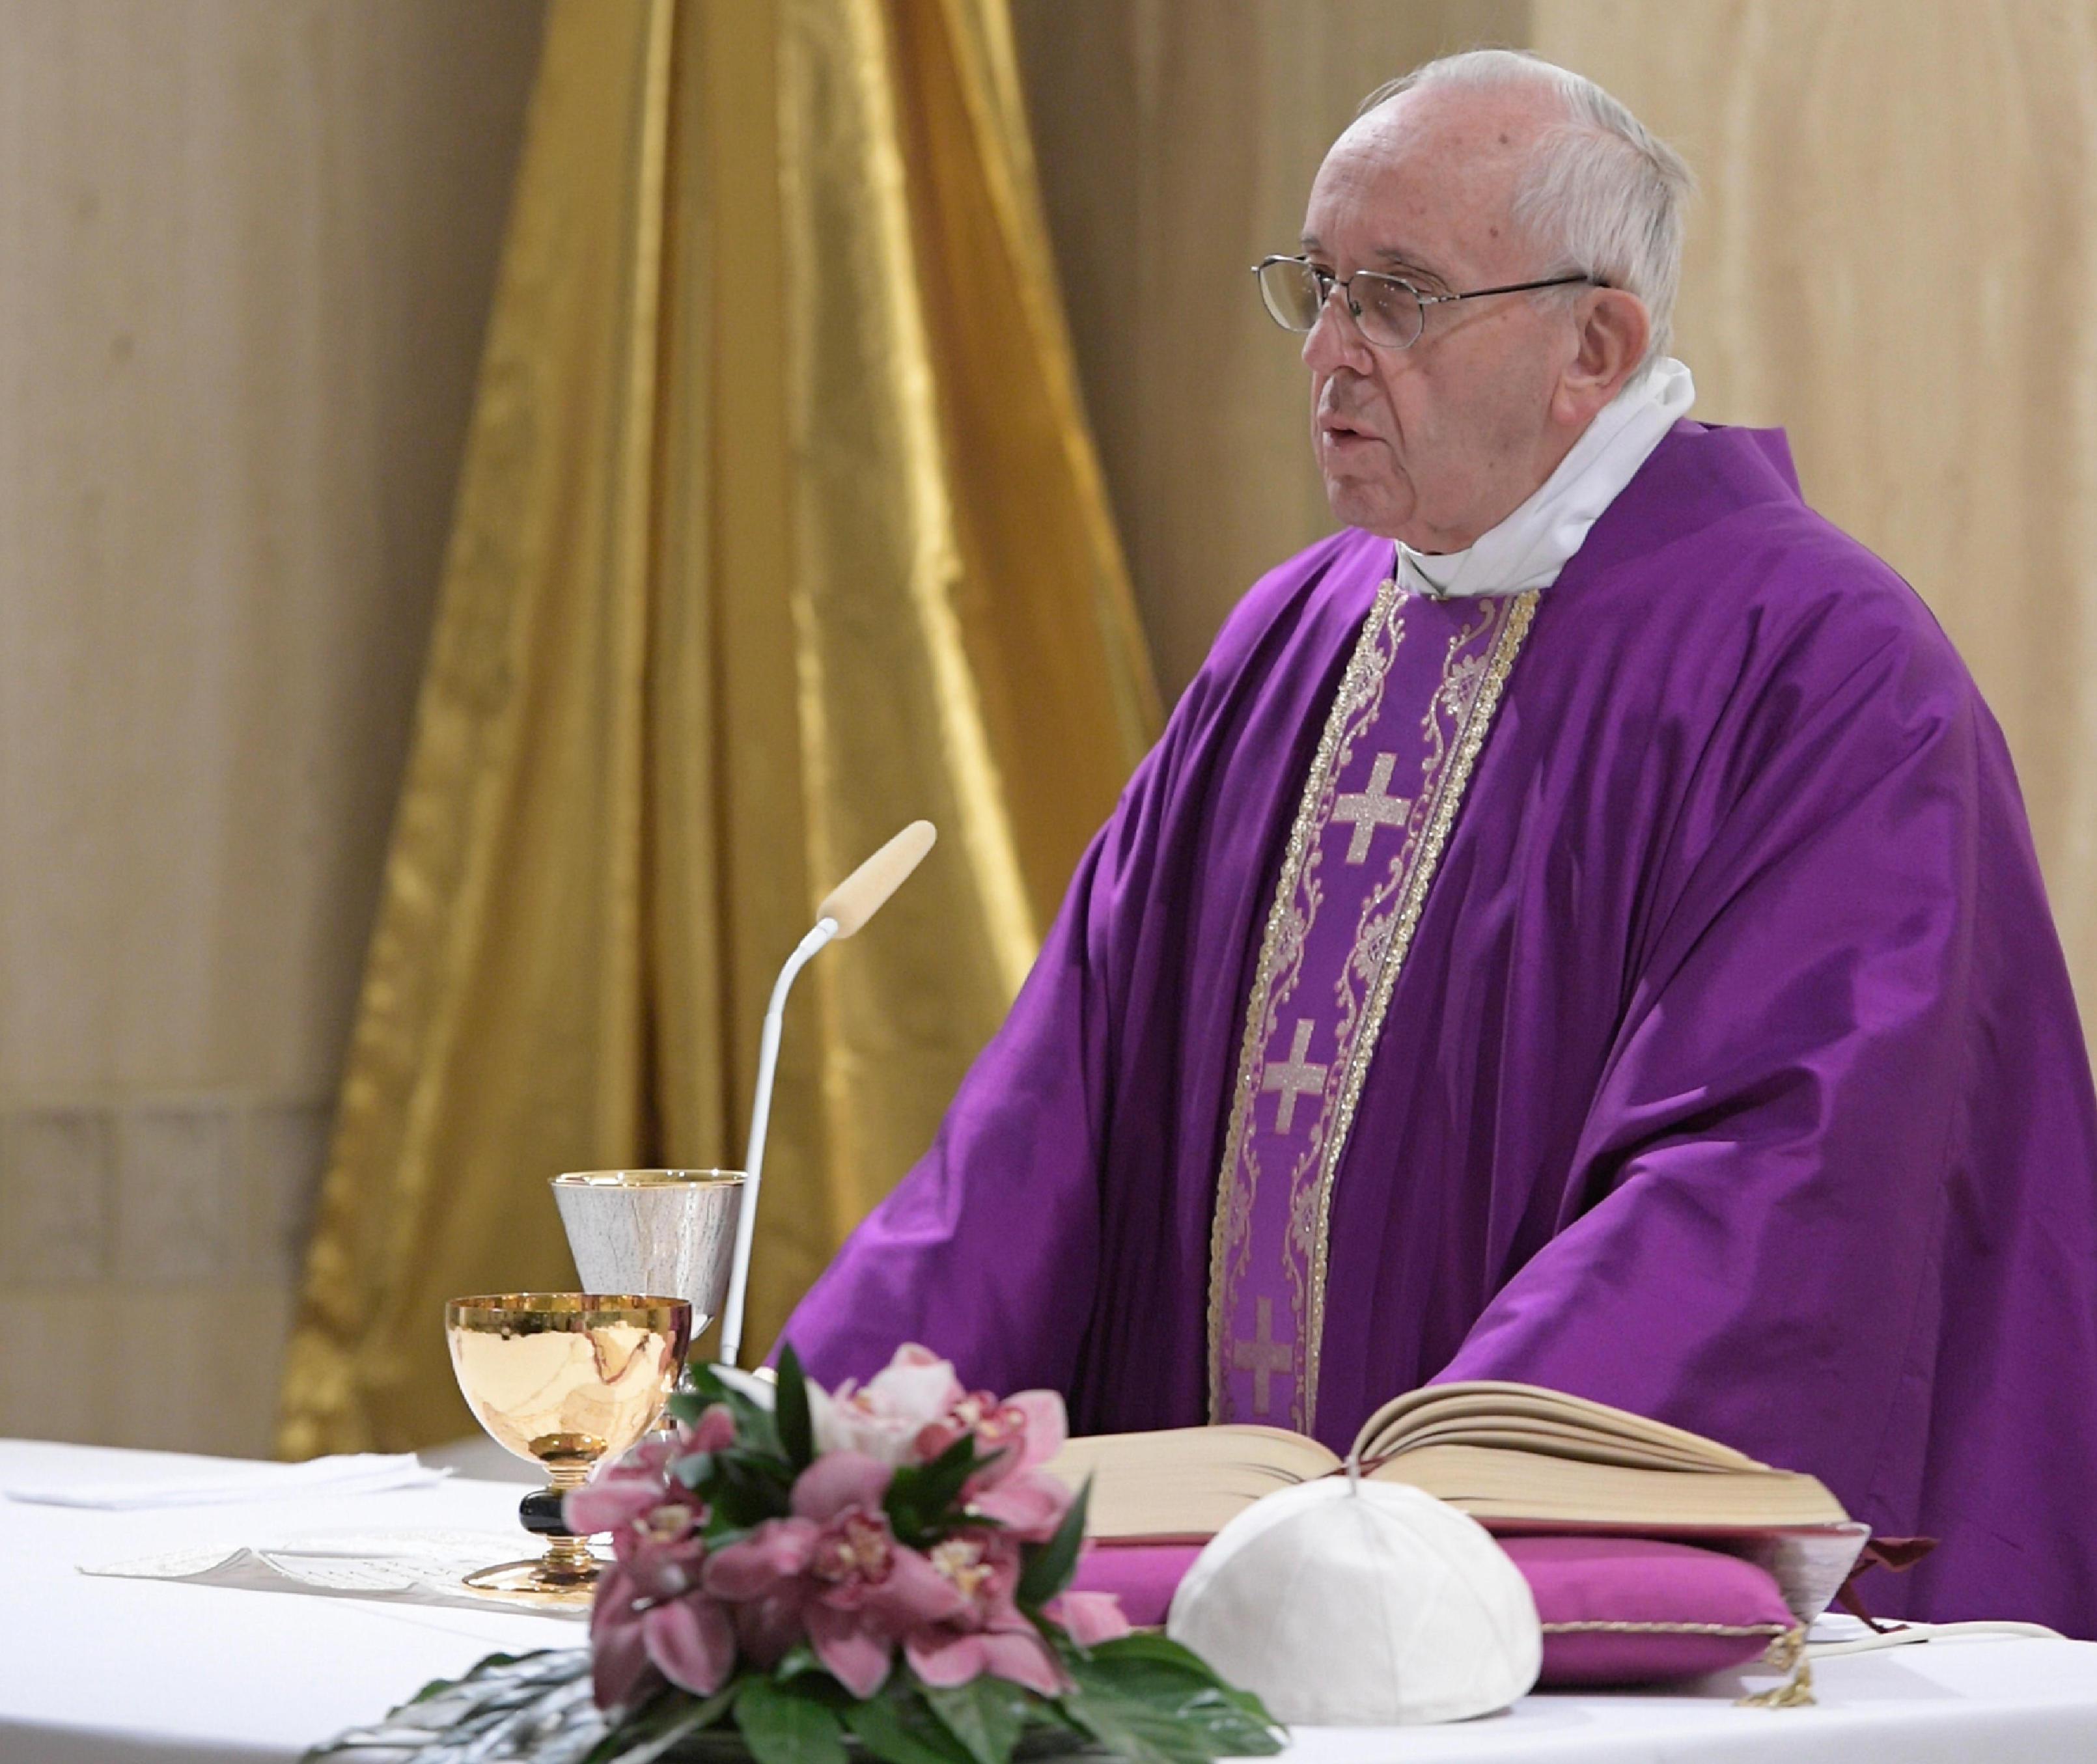 Misa del Papa en Santa Marta 19/12/2017 © L'Osservatore Romano